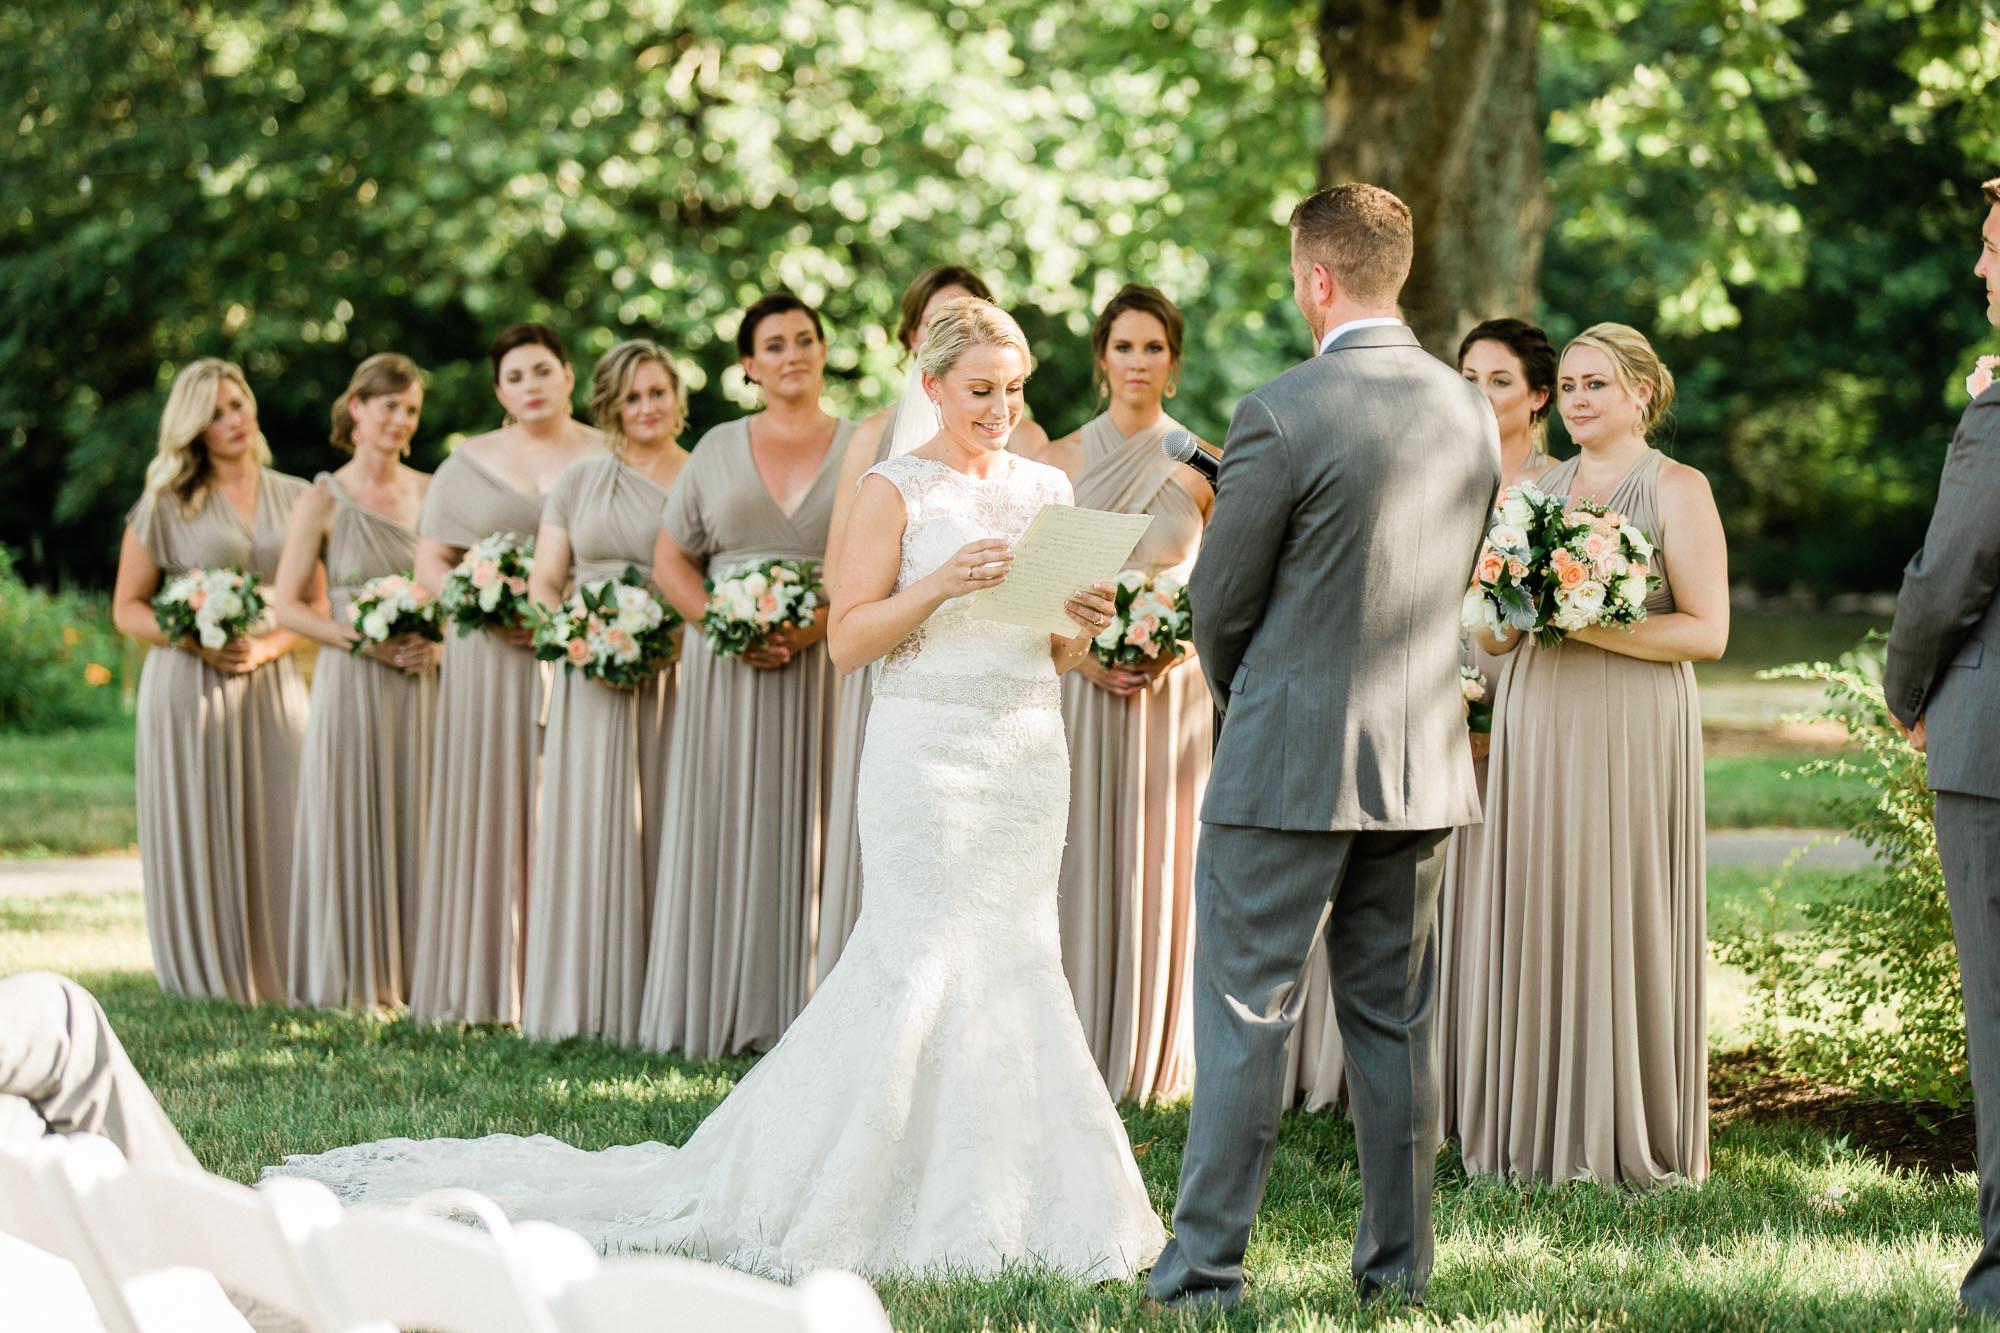 Allenberry-resort-historic-pennsylvania-wedding-22007.jpg